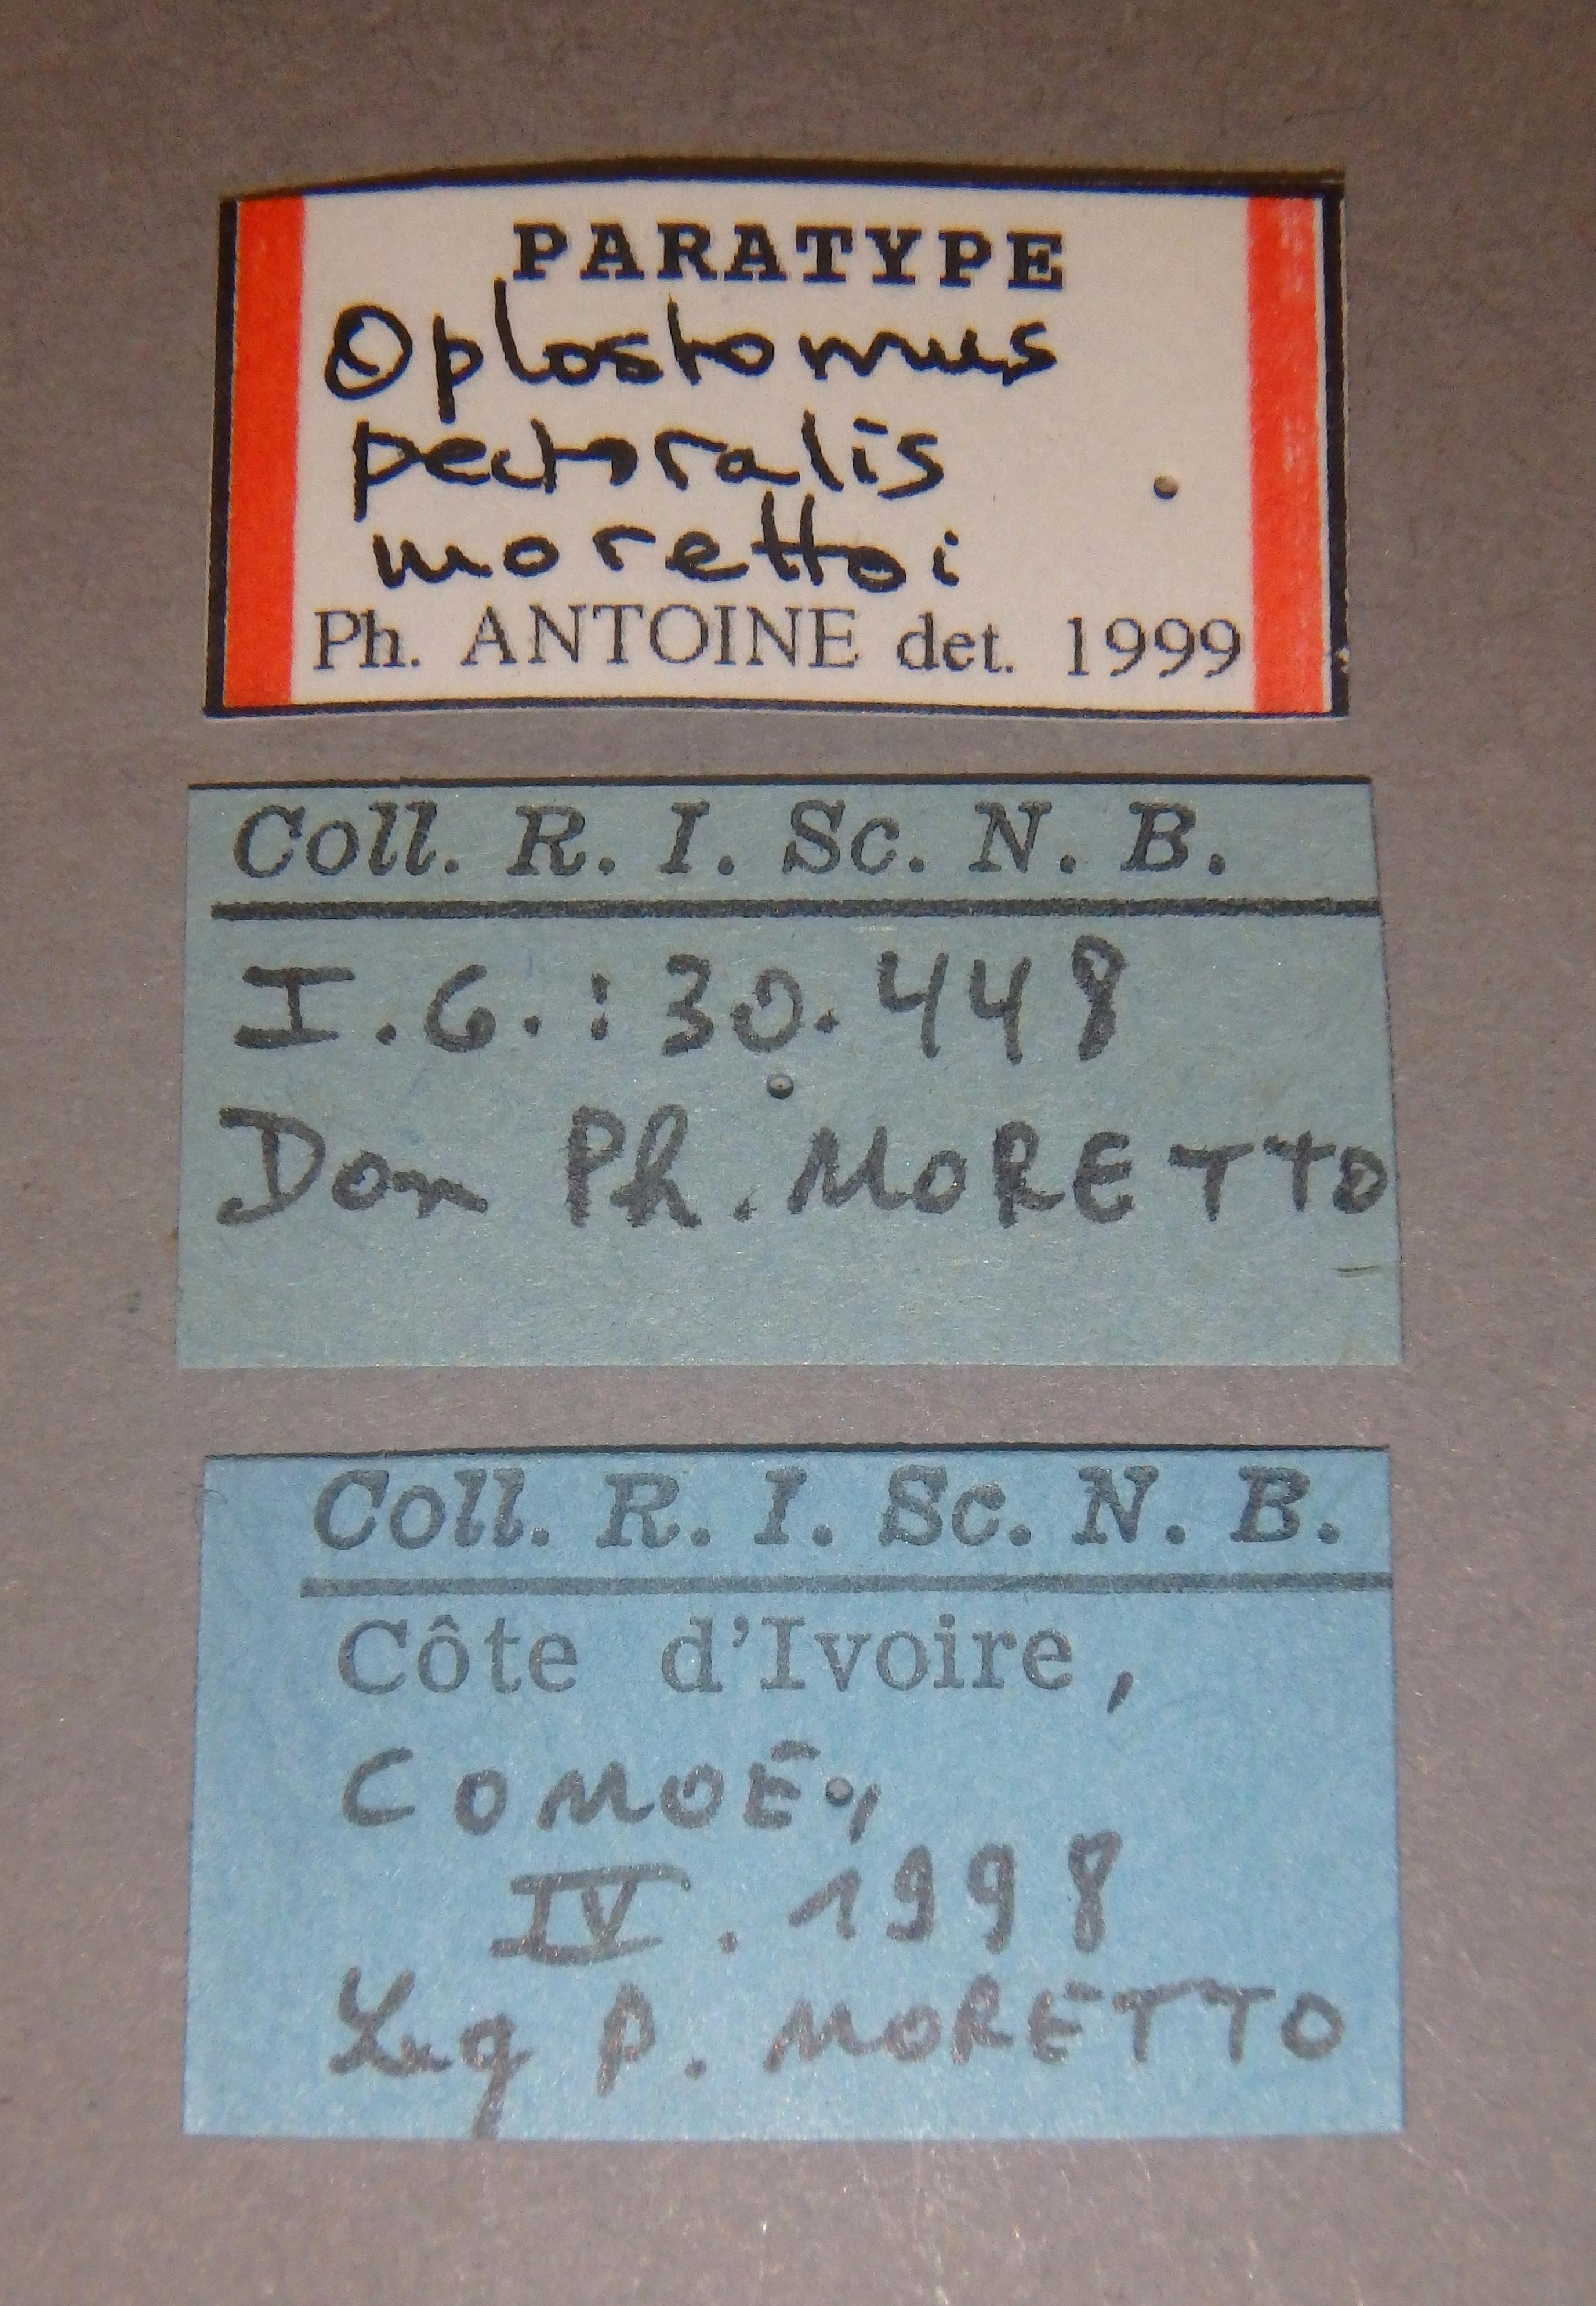 Oplostomus pectoralis morettoi pt1 Lb.JPG